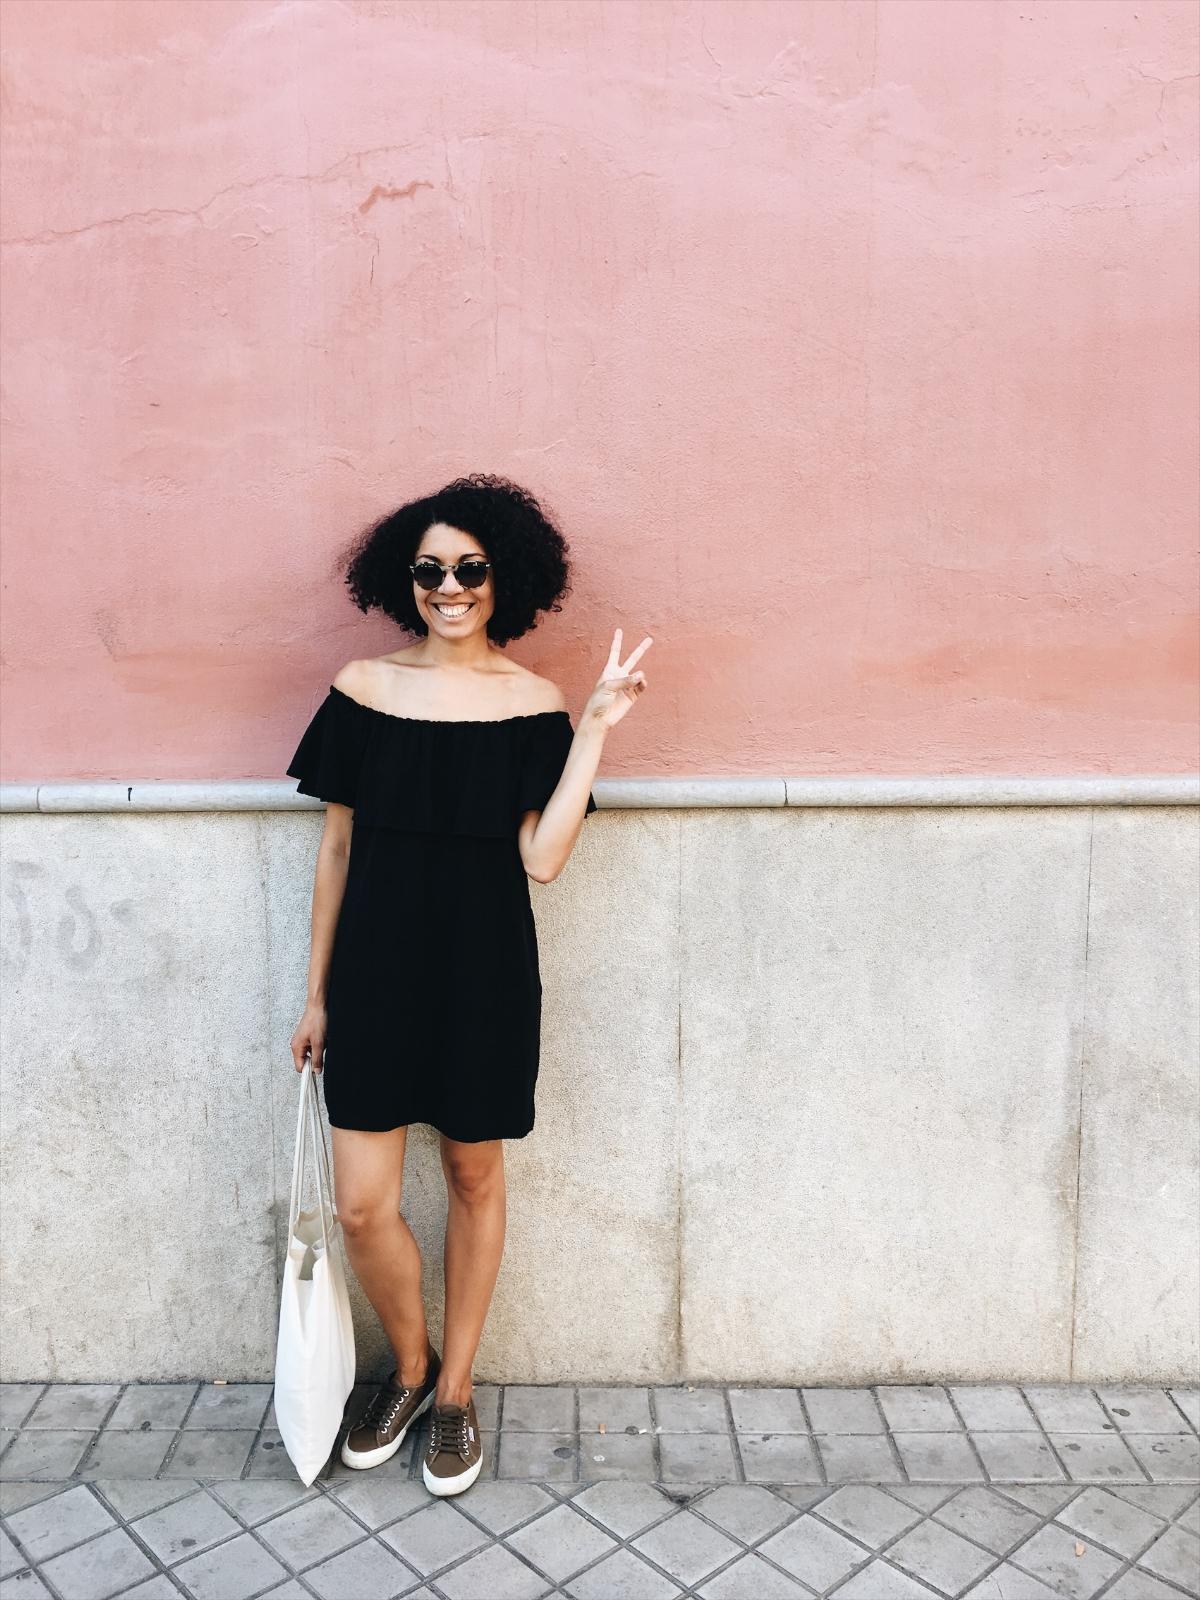 b1878-seesoomuch_minimalist_travel_wardrobe_packingseesoomuch_minimalist_travel_wardrobe_packing.jpg